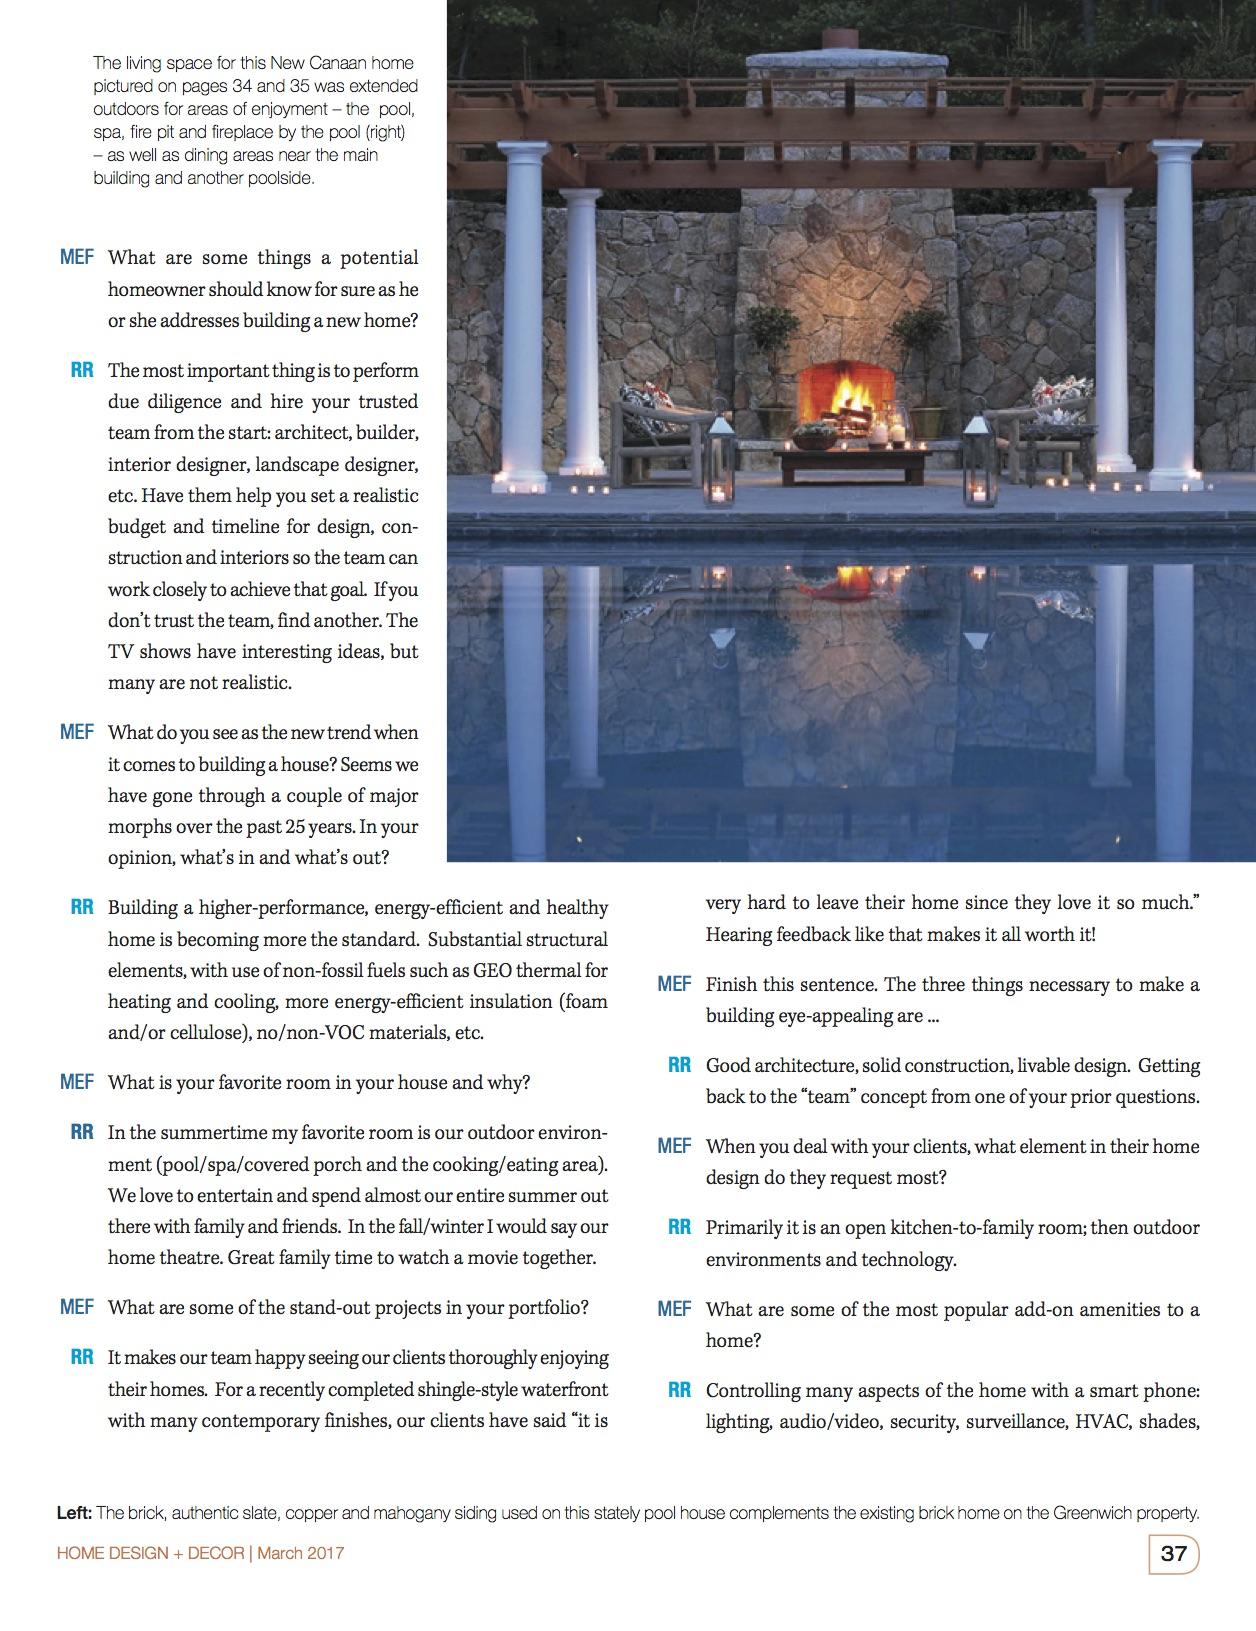 2017 Hearst CT Home Design magazine 37.jpg